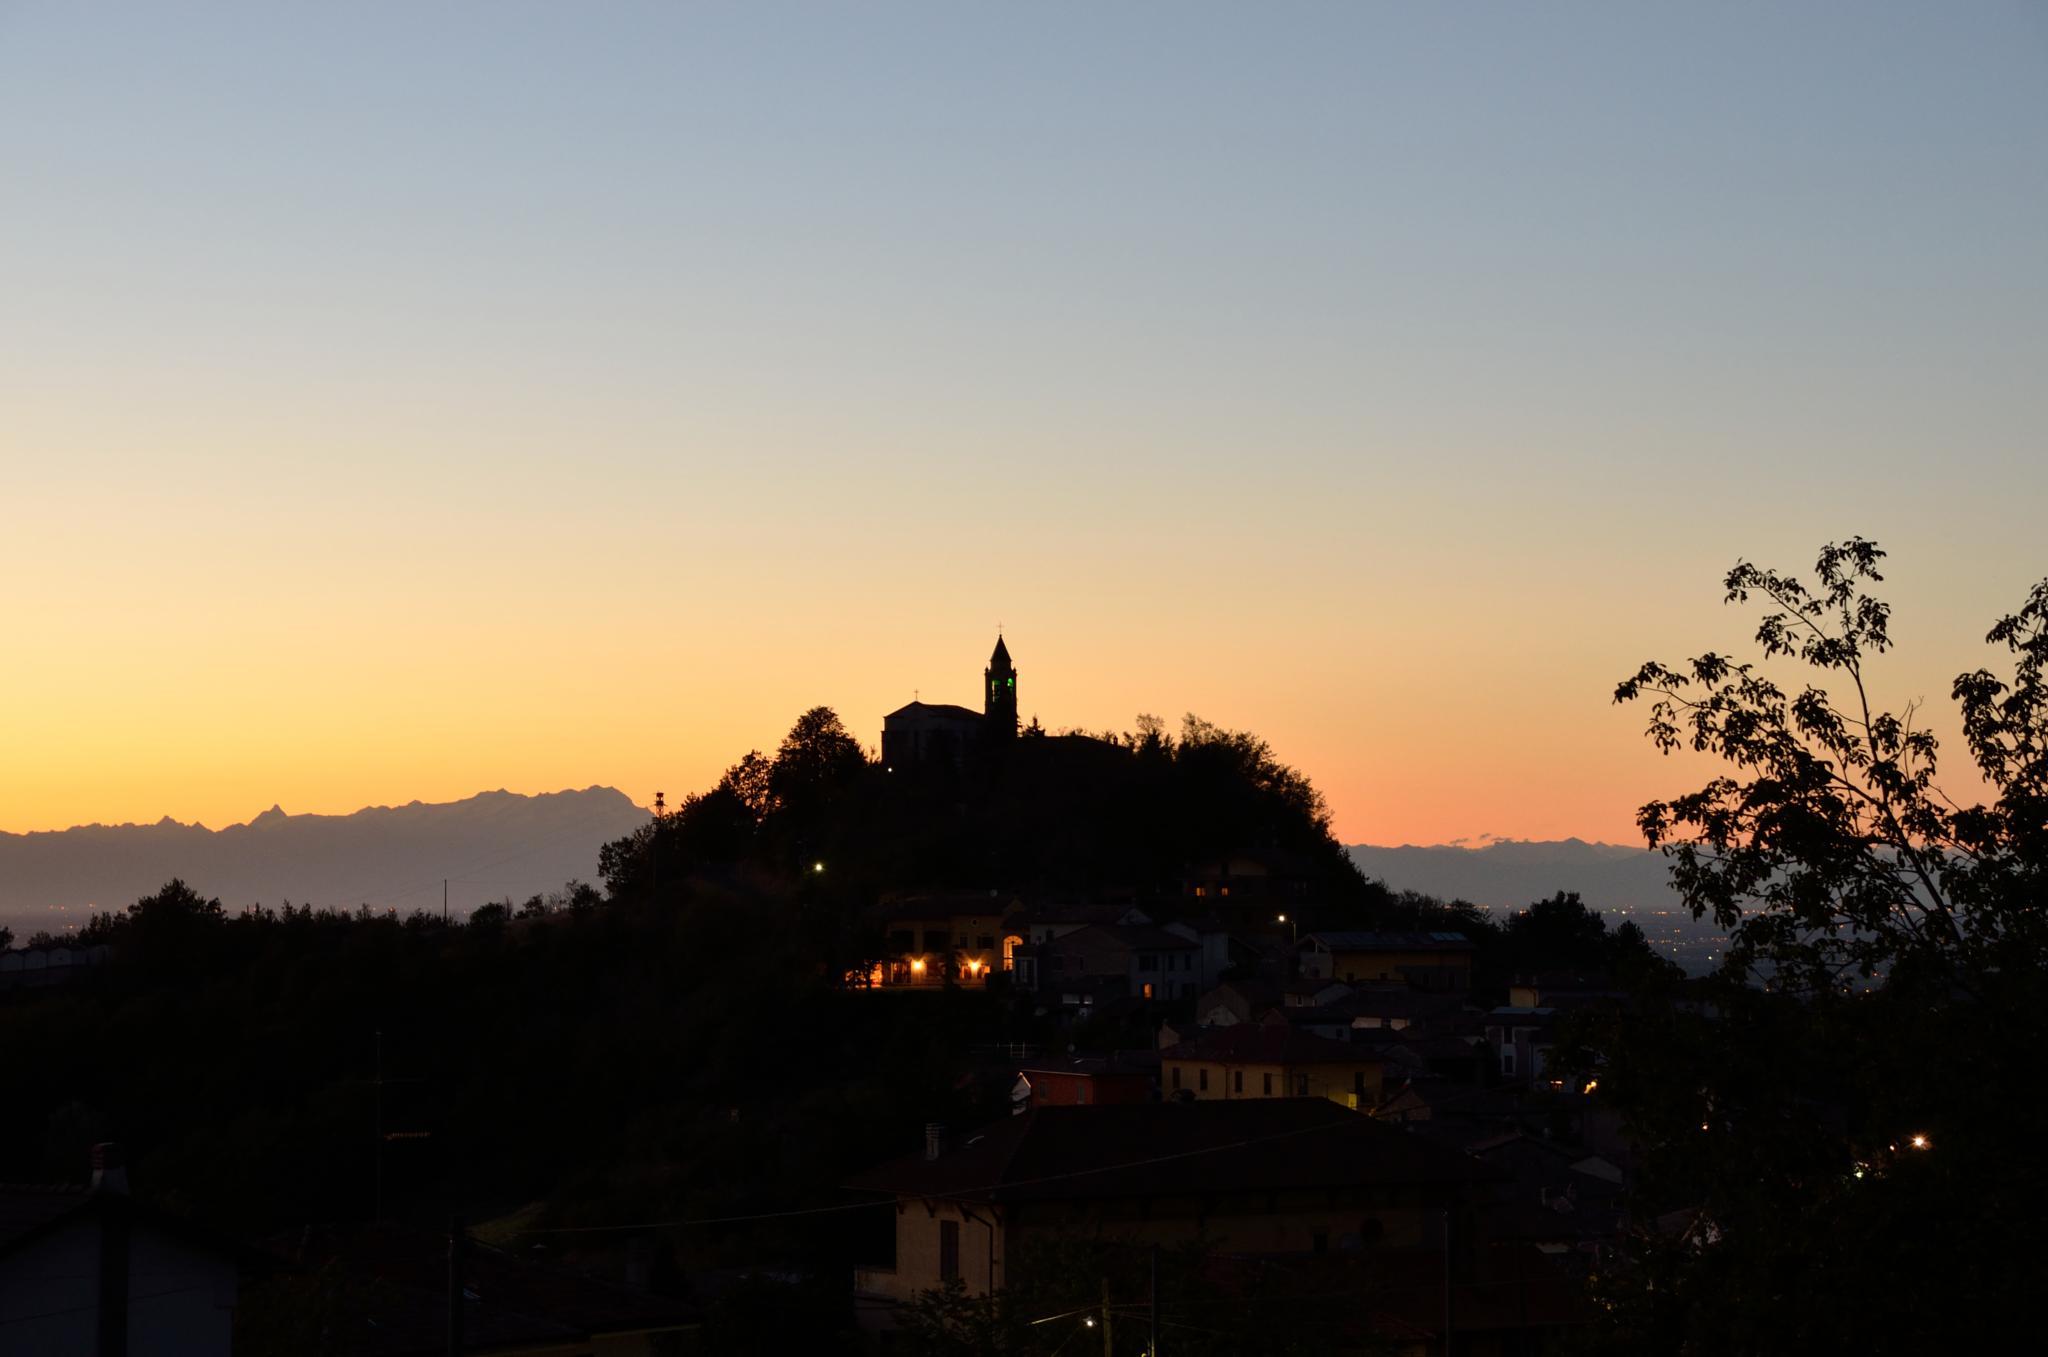 Sunset to Avolasca by Marco Mandirola